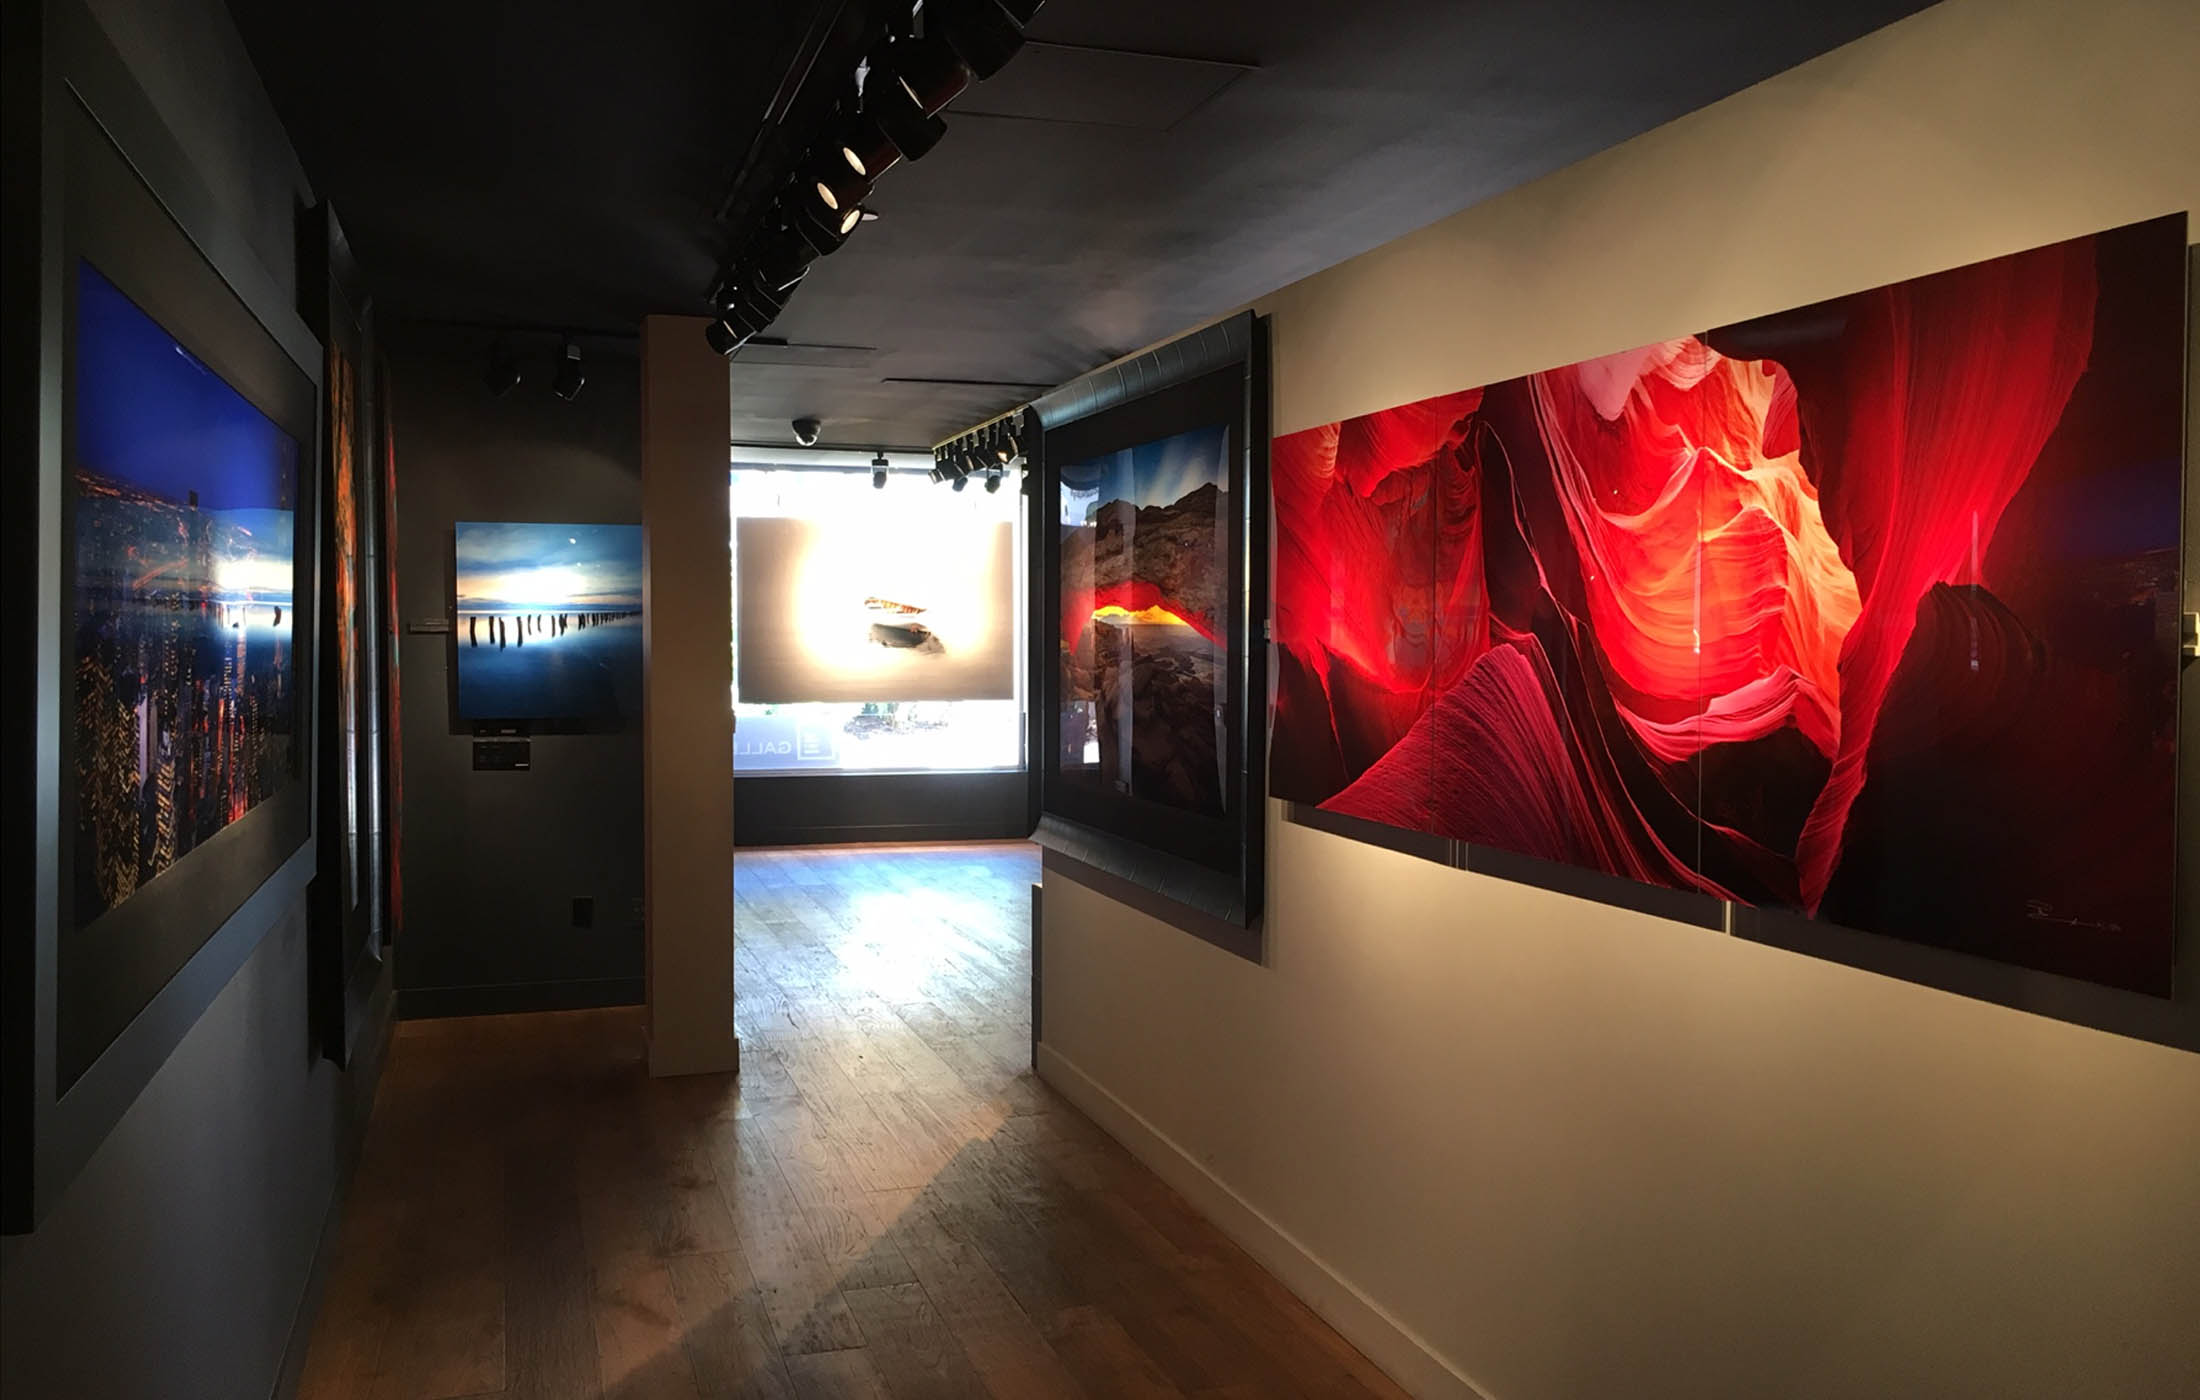 Lincoln Road BID Gallery